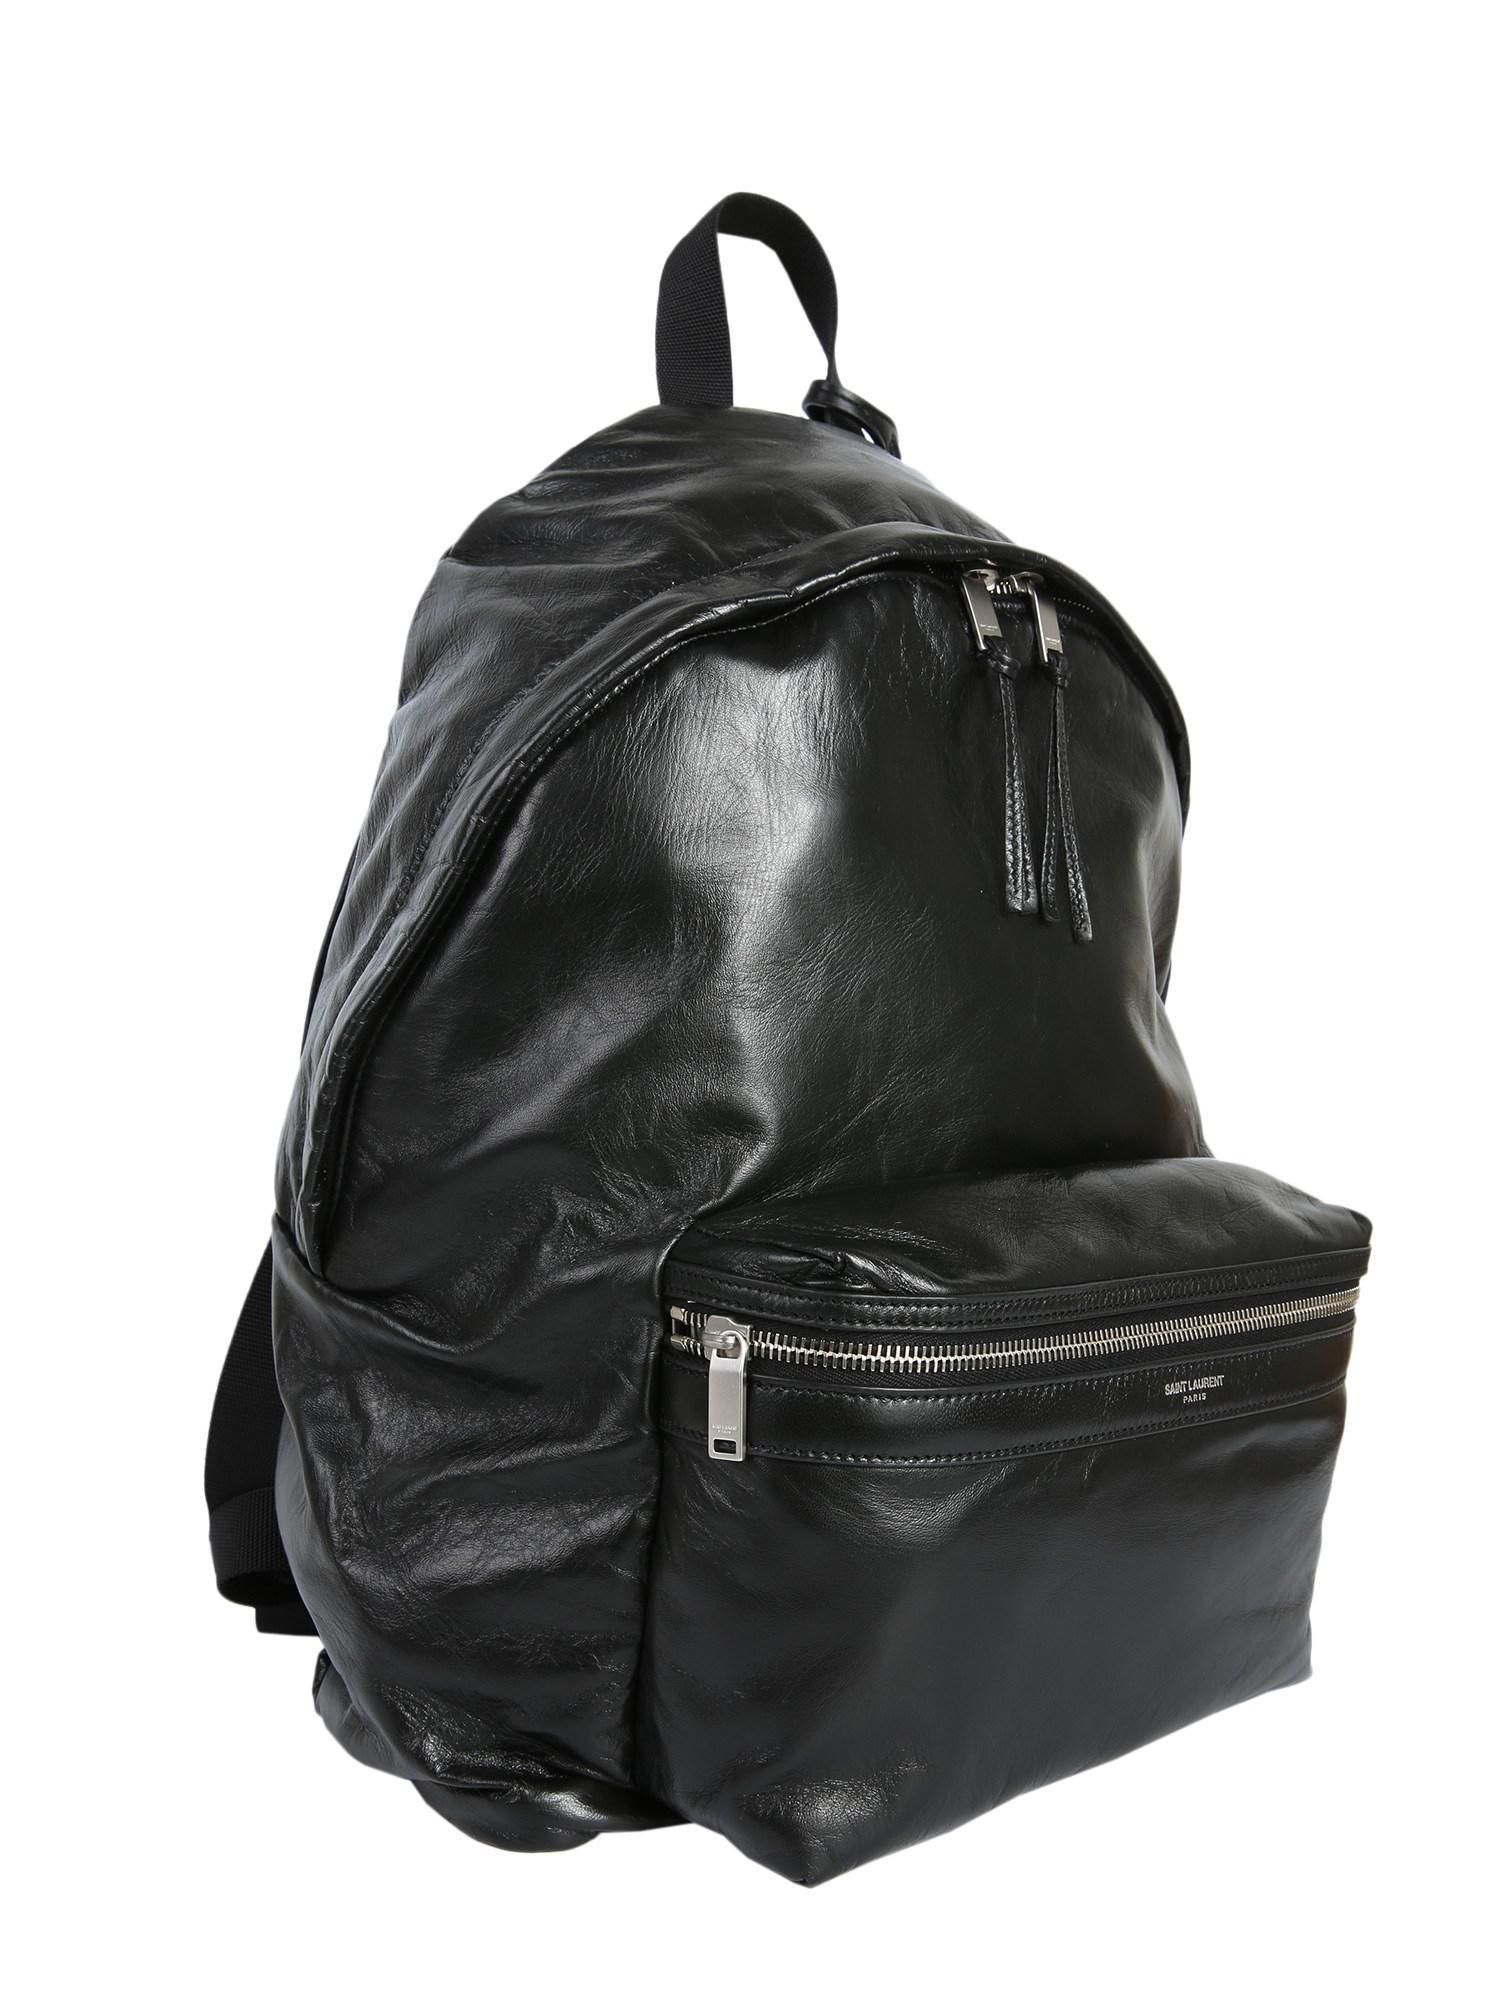 6e41a6ab8010 Saint Laurent - Black Foldable Leather City Backpack - Lyst. View fullscreen